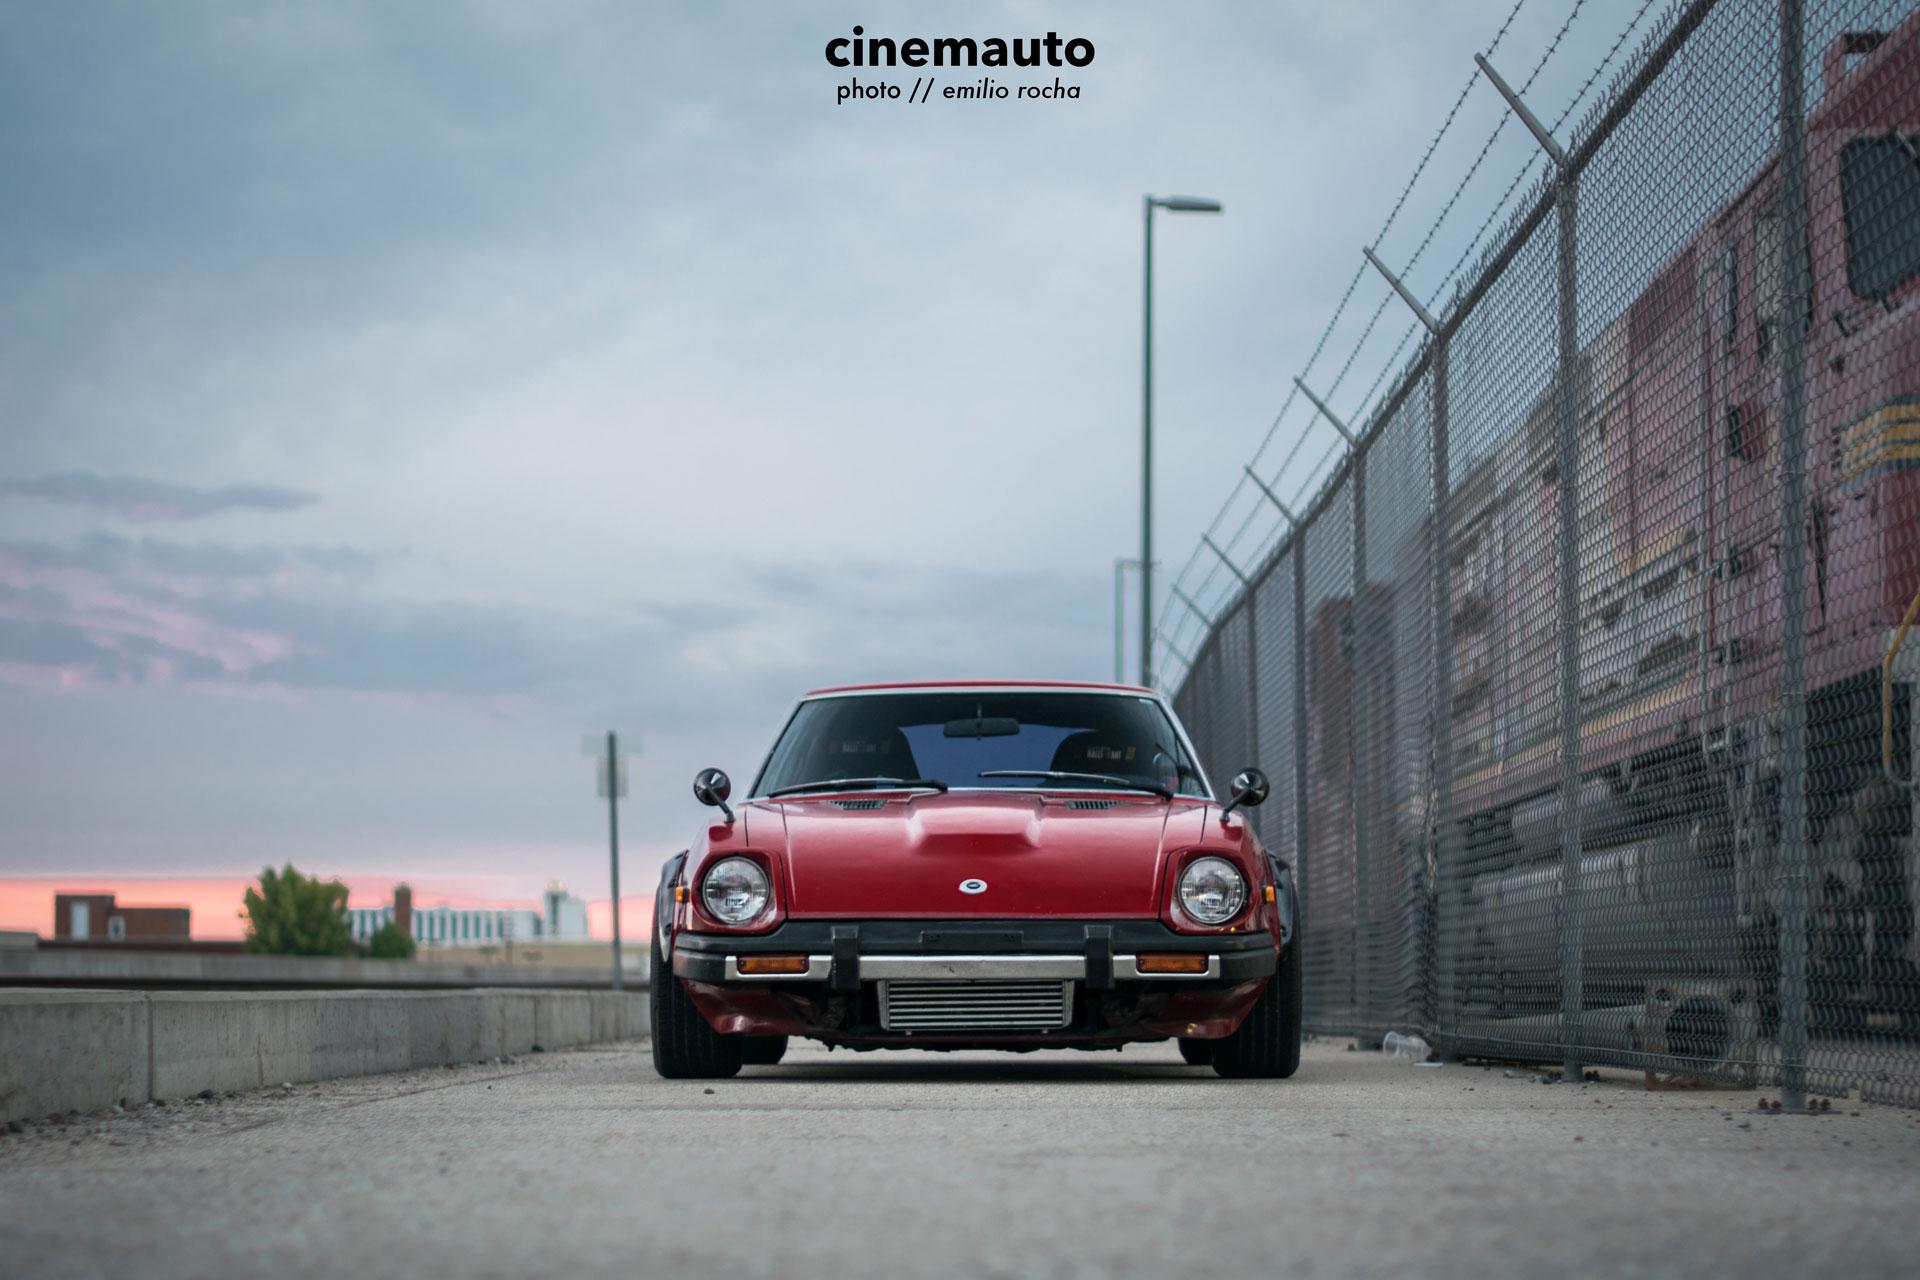 cinemauto-kansas-automotive-photography-datsun19.jpg